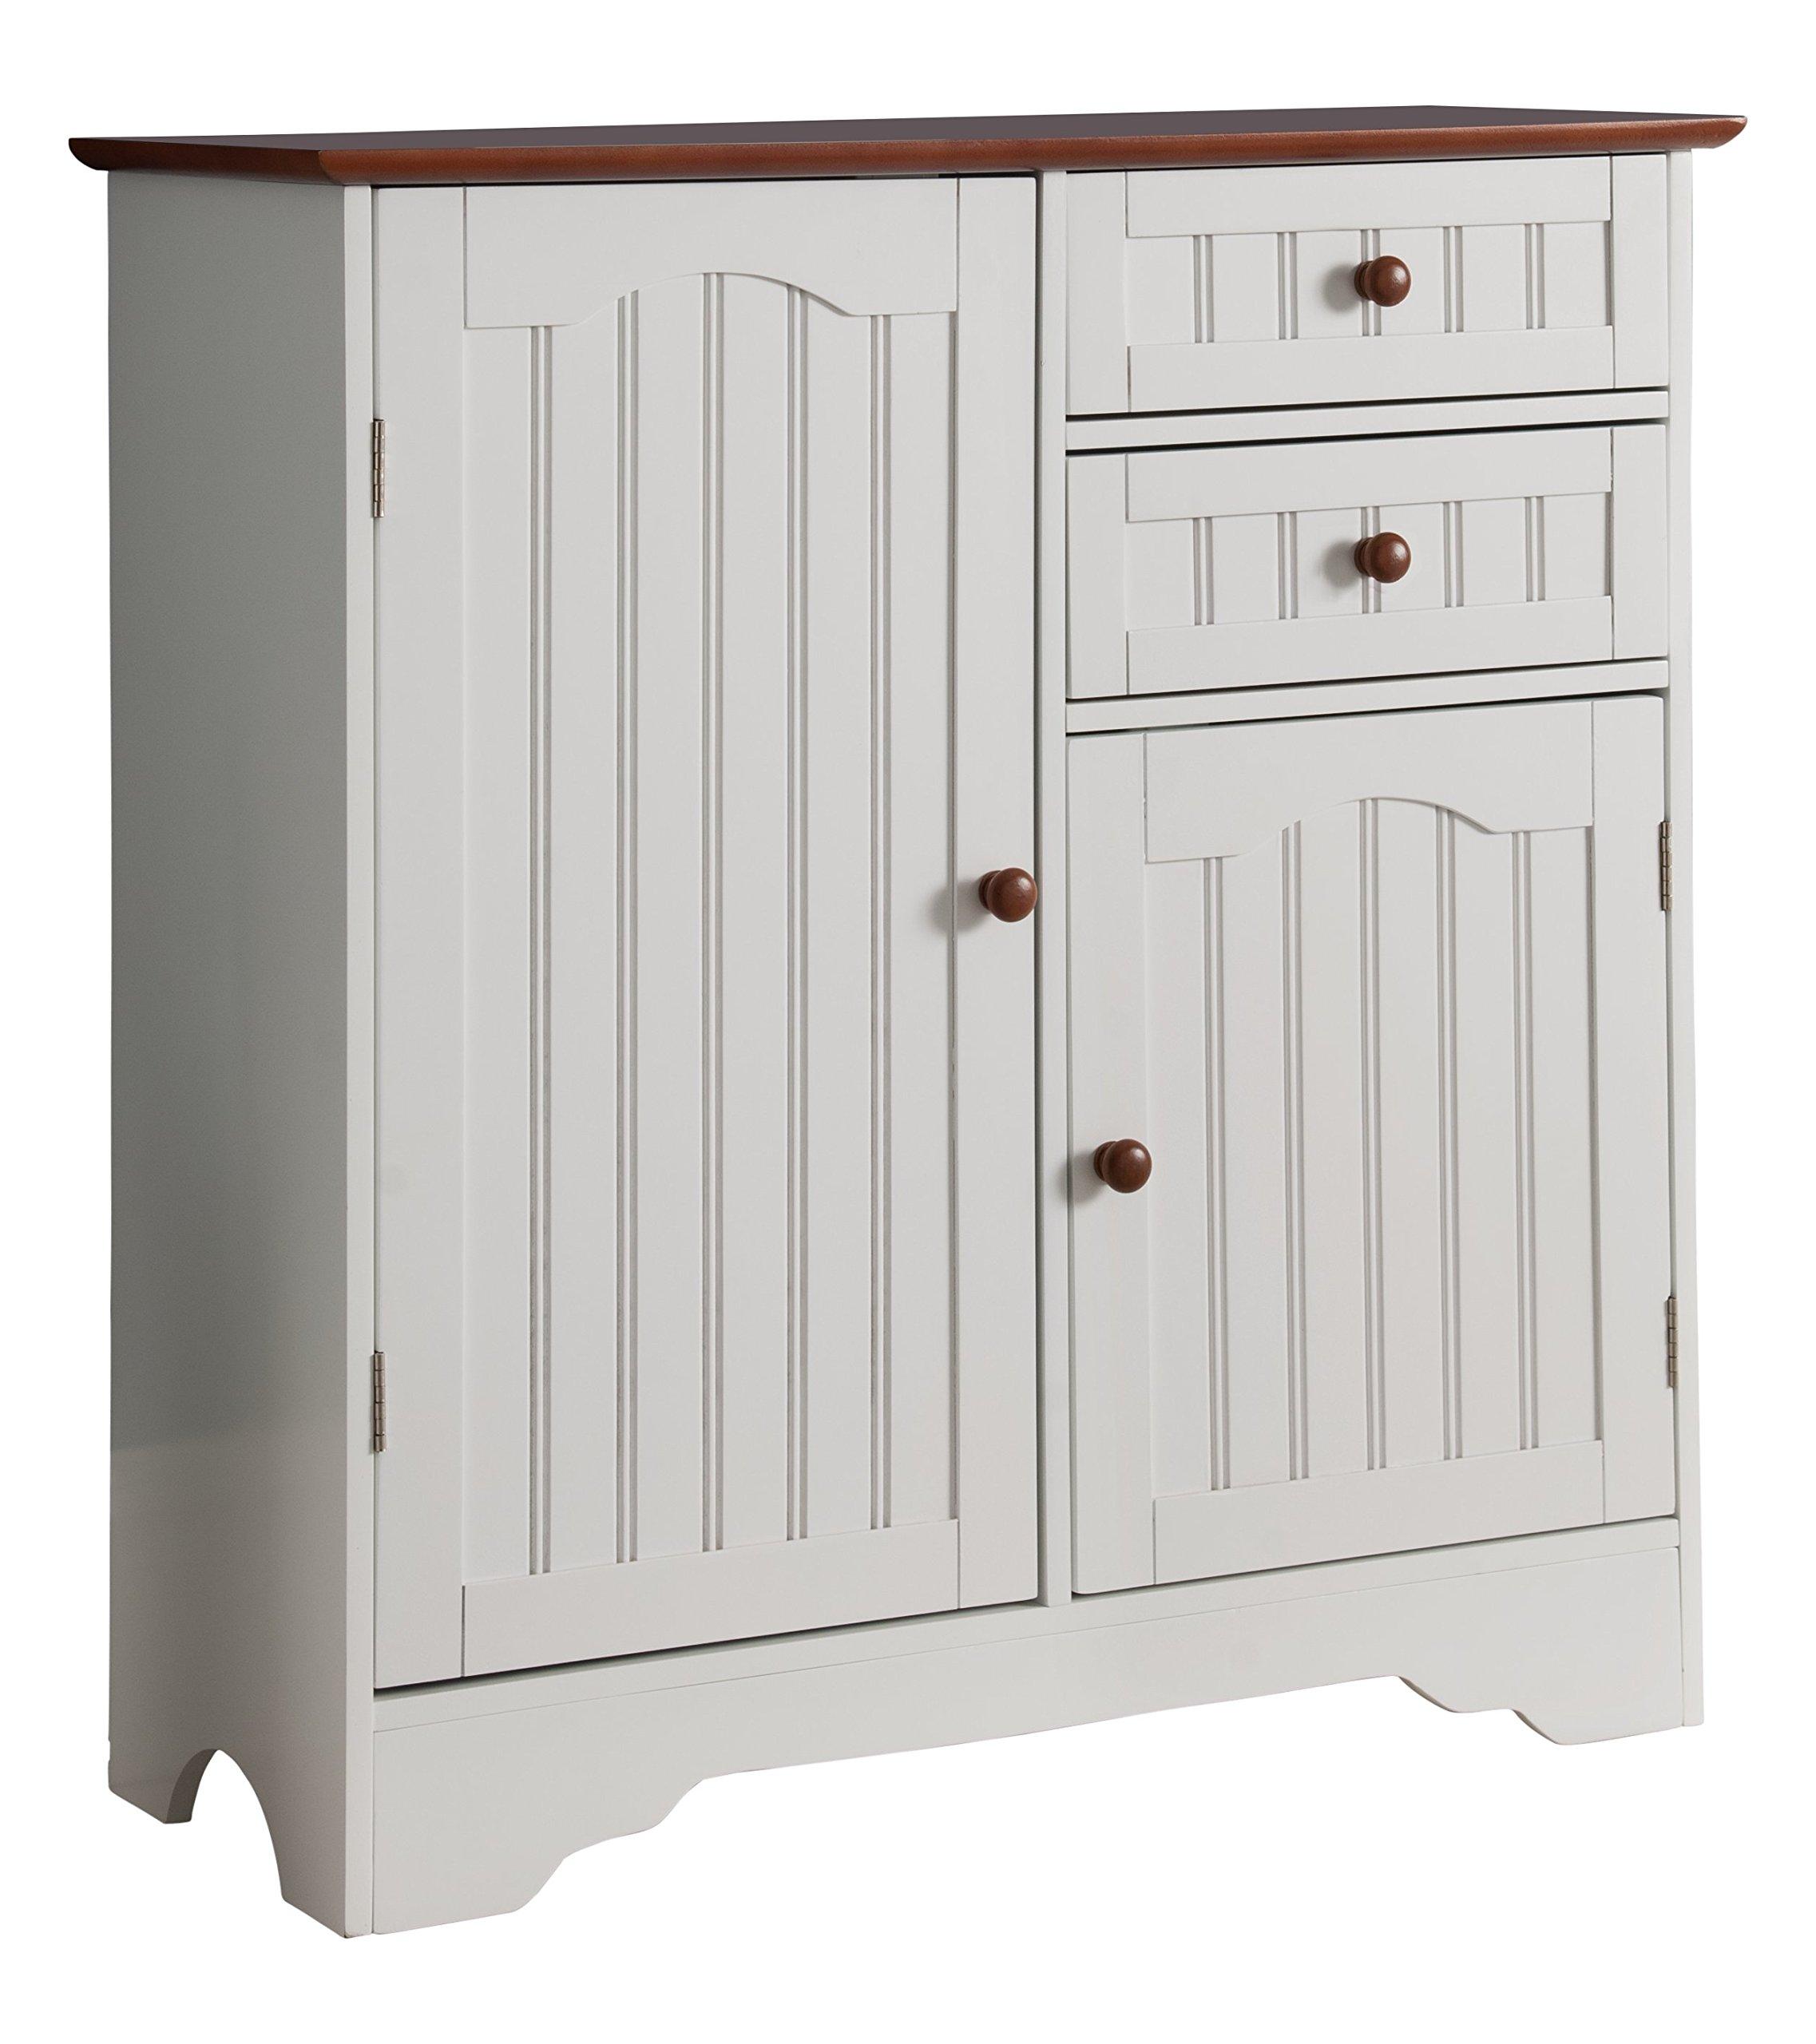 White Kitchen Buffet Cabinet: Kings Brand White/Walnut Finish Wood Kitchen Storage